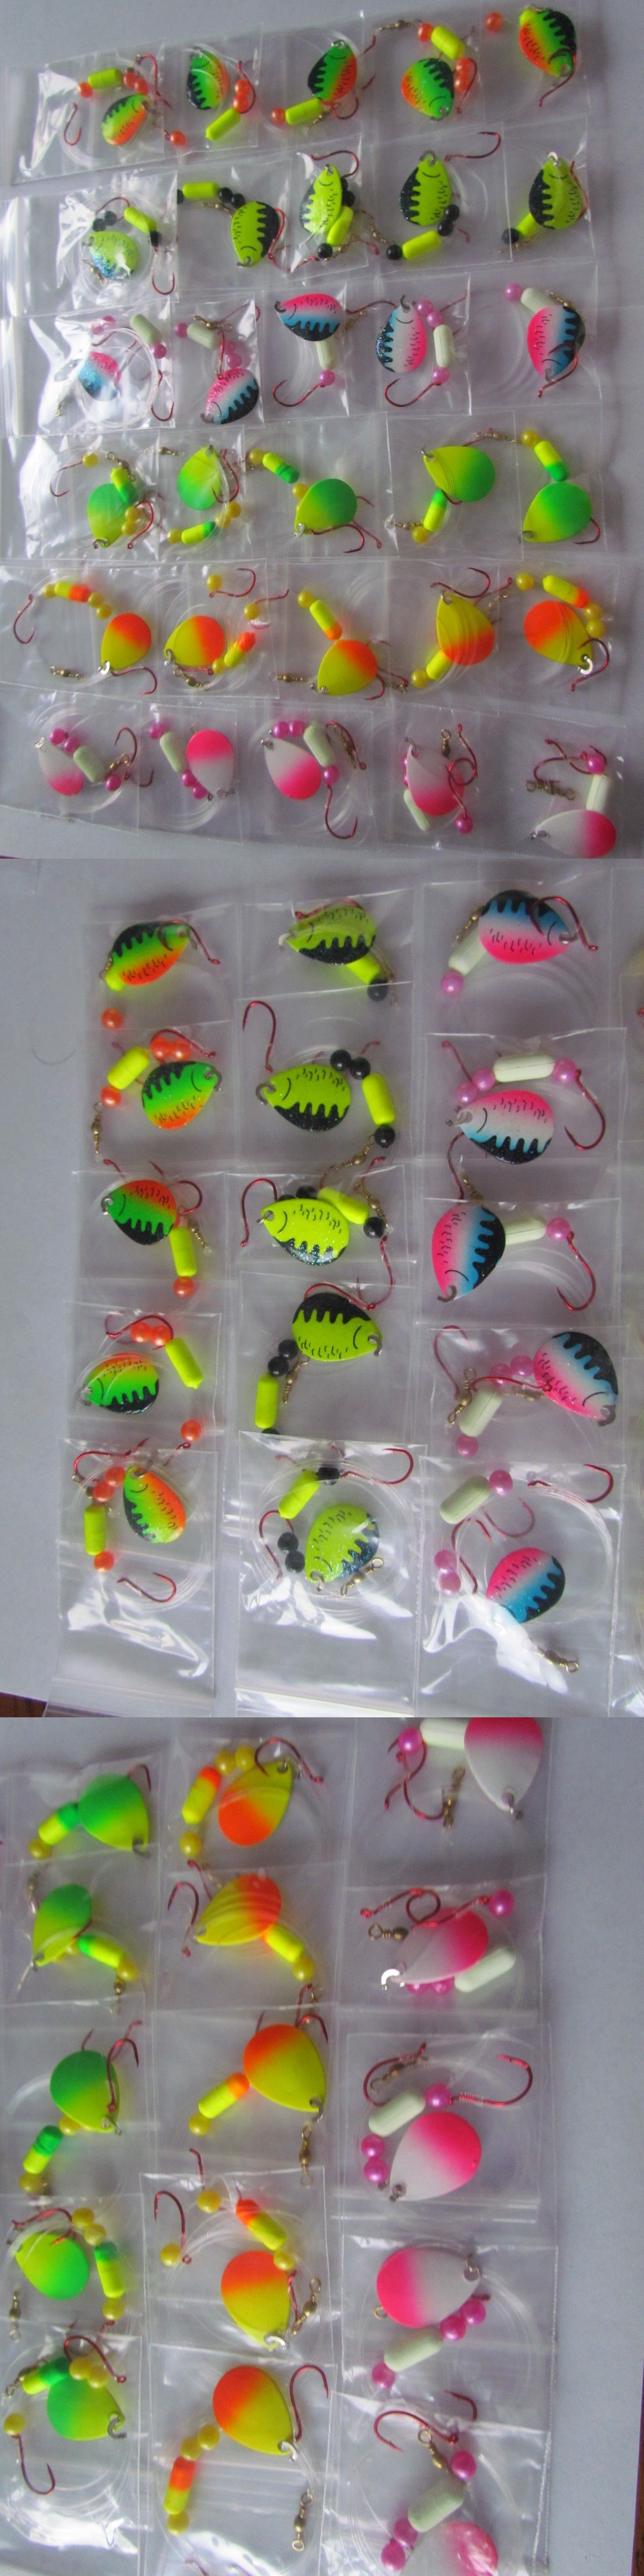 30 Spinner Floater Rigs Leech Minnow Crawler Harness Walleye Bass Pike Size 3